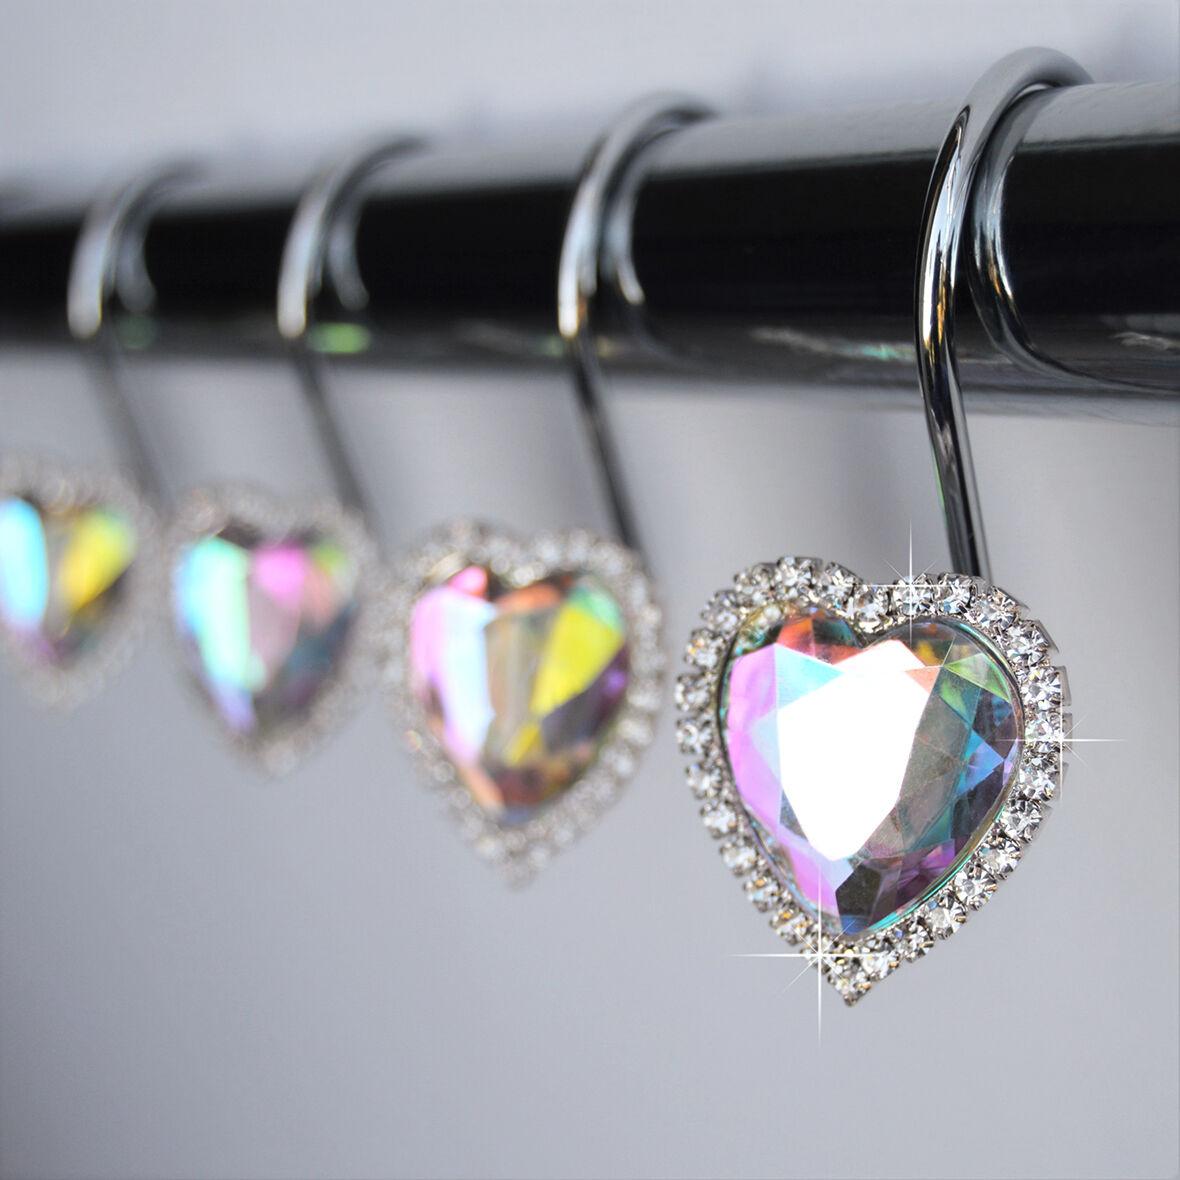 Rhinestone shower curtain hooks - Shower Curtain Hooks Rings Heart Rhinestone Bling Love